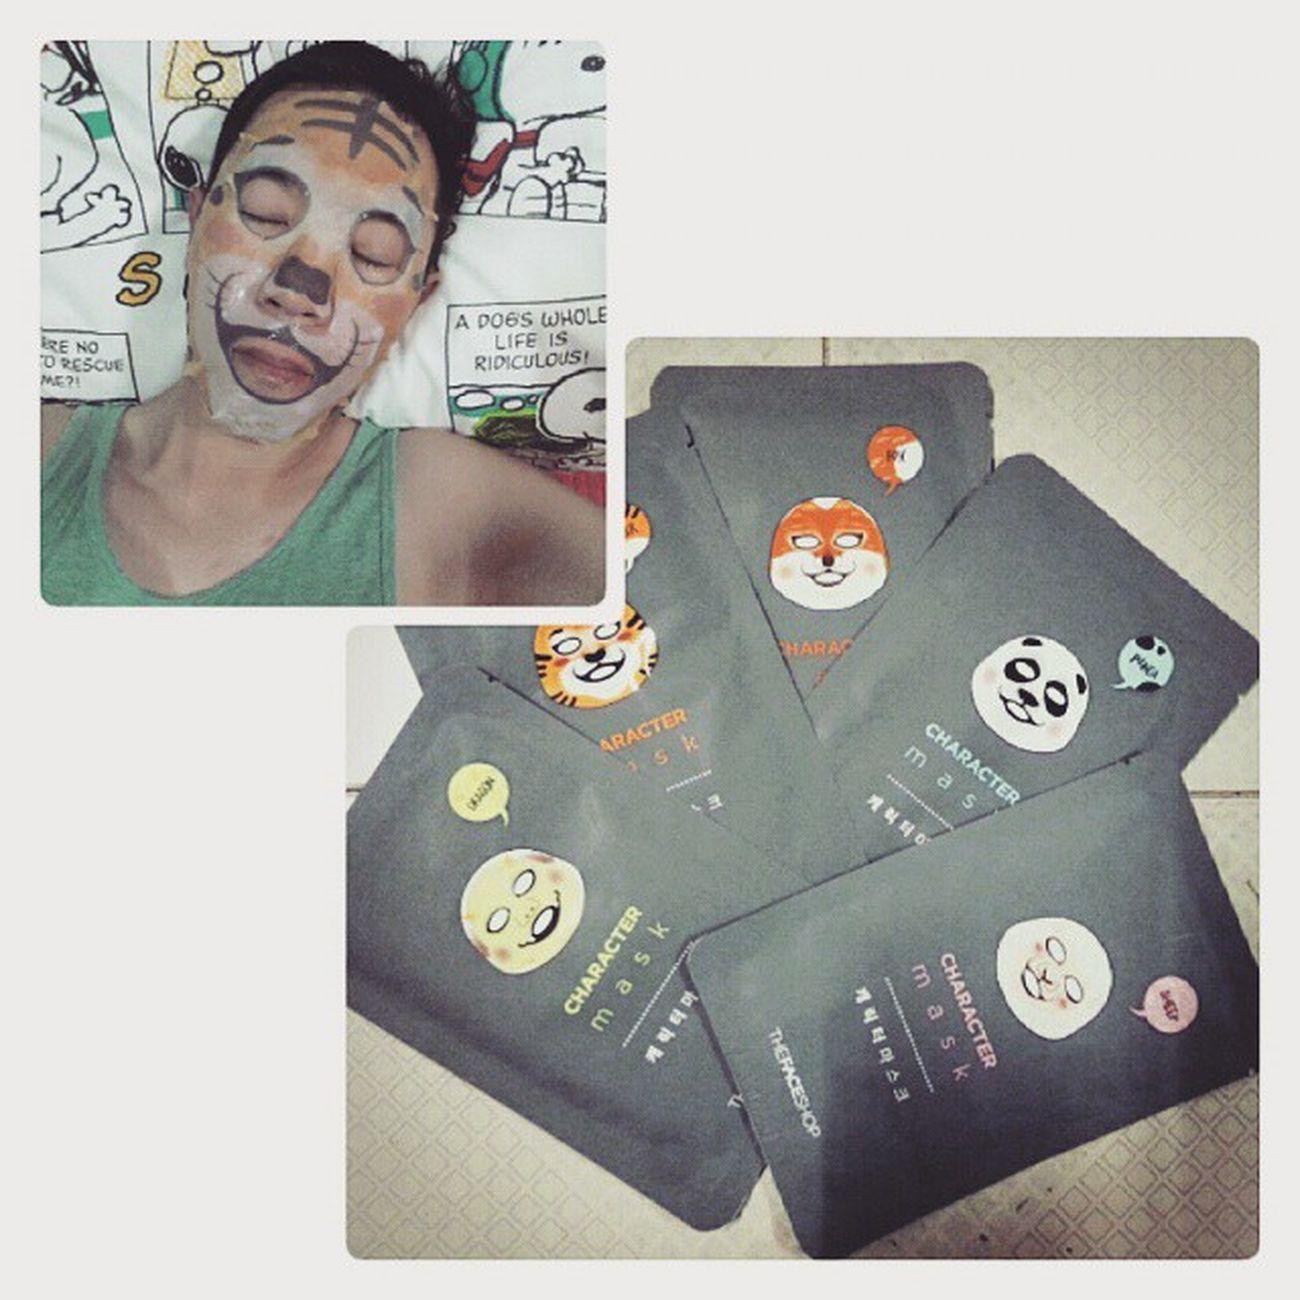 ROAR Tonight I will be TIGER 🐯🐯🐯🐯🐯 TheFaceShop Korea Charactormask Tiger 🐯 dragon 🐉 fox panda 🐼 sheep 🐑